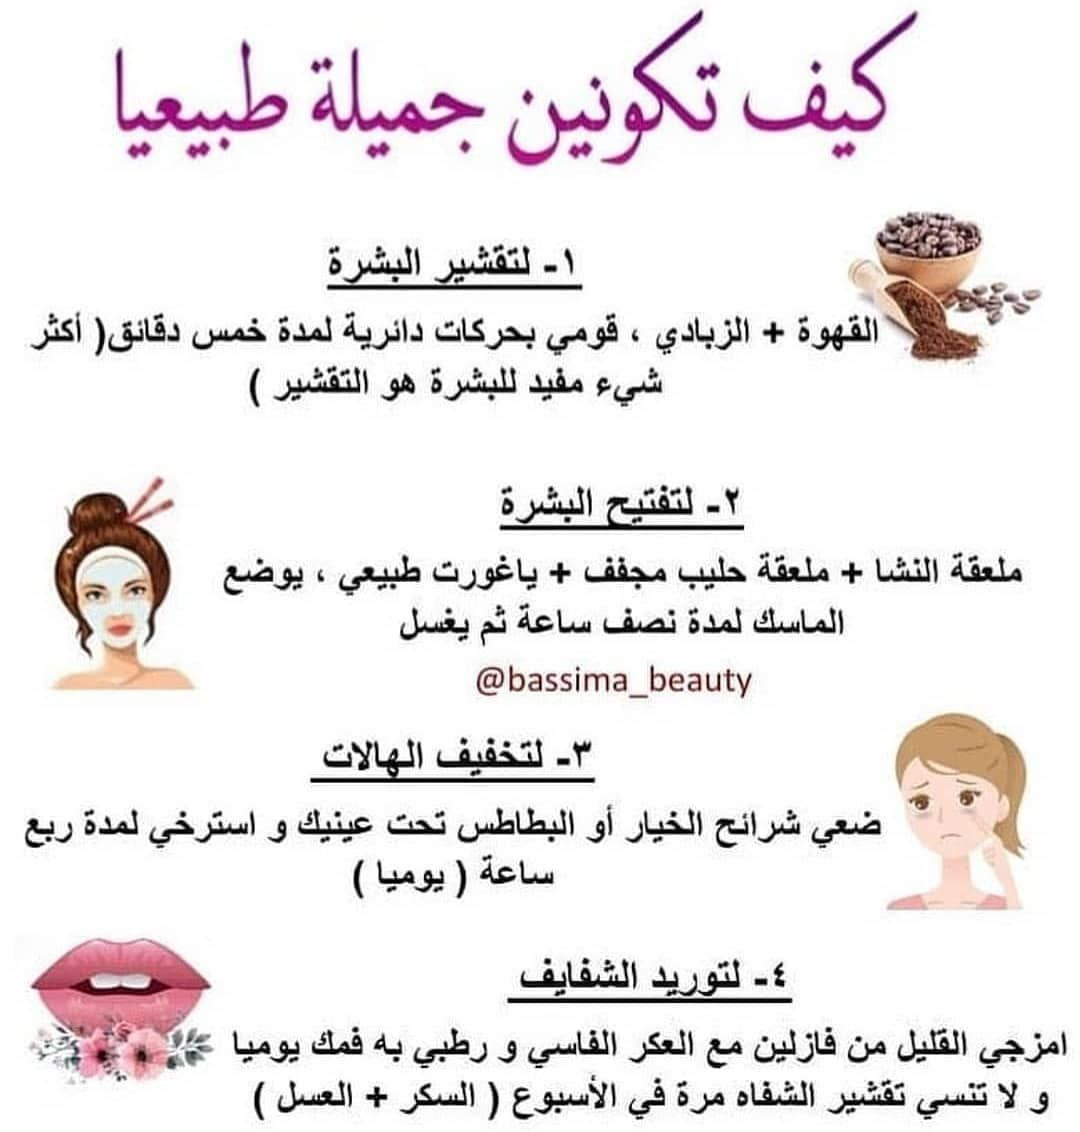 تساقط الشعر اطاله الشعر تكيسات مبايض تكثيف الشعر نضارة تفتيح هالات استرتش مارك Natural Skin Care Diy Facial Skin Care Routine Beauty Skin Care Routine